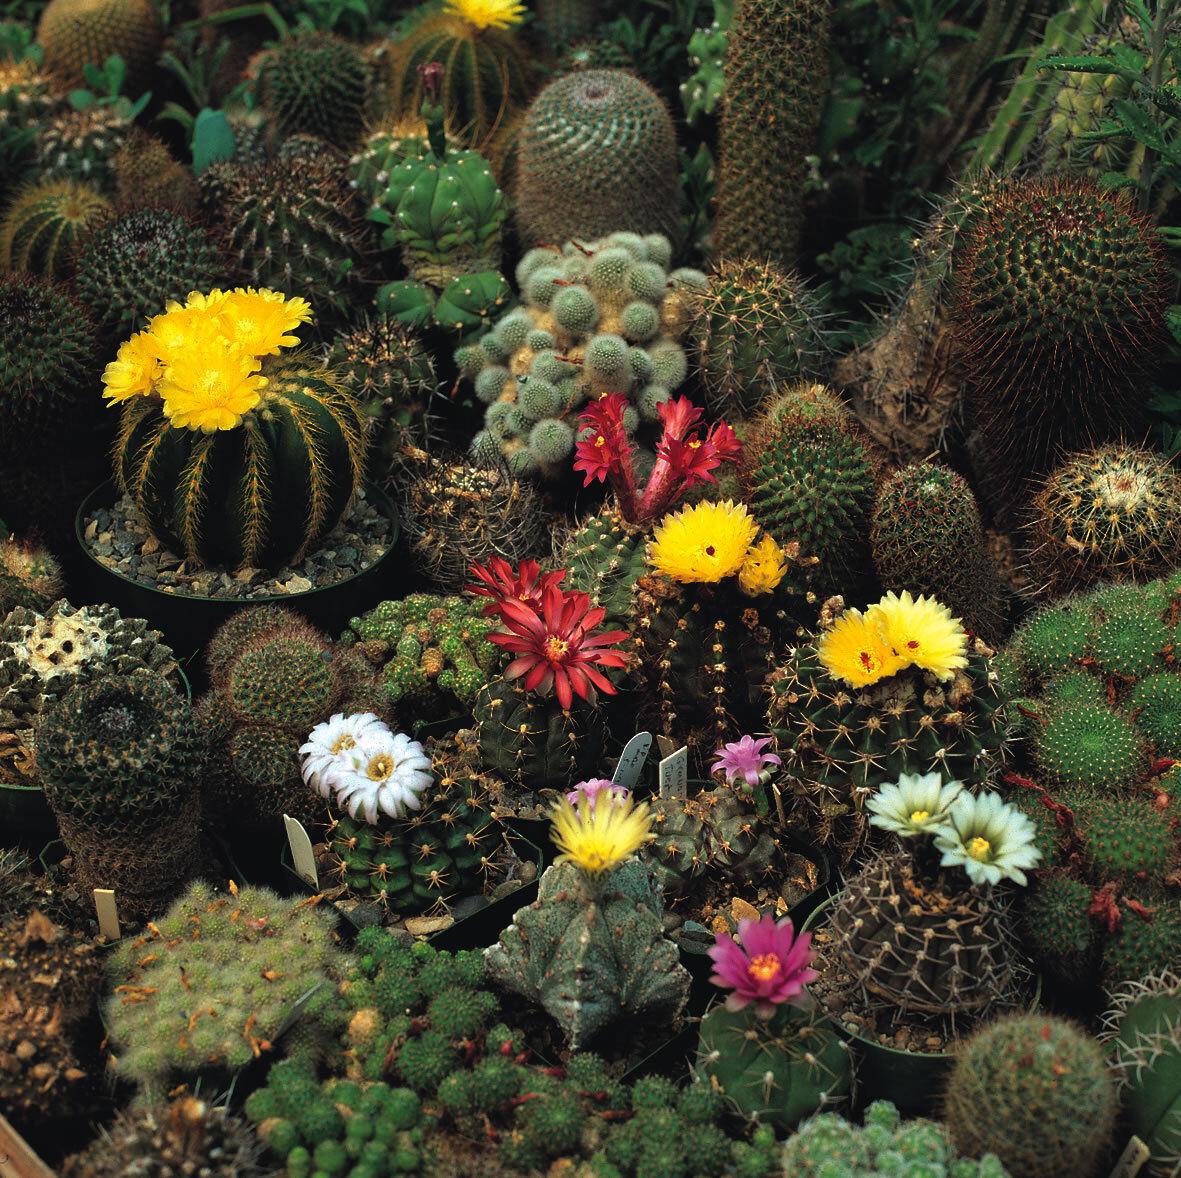 Cactus Crown Mixed x25 seeds Flowering Cactus Seed